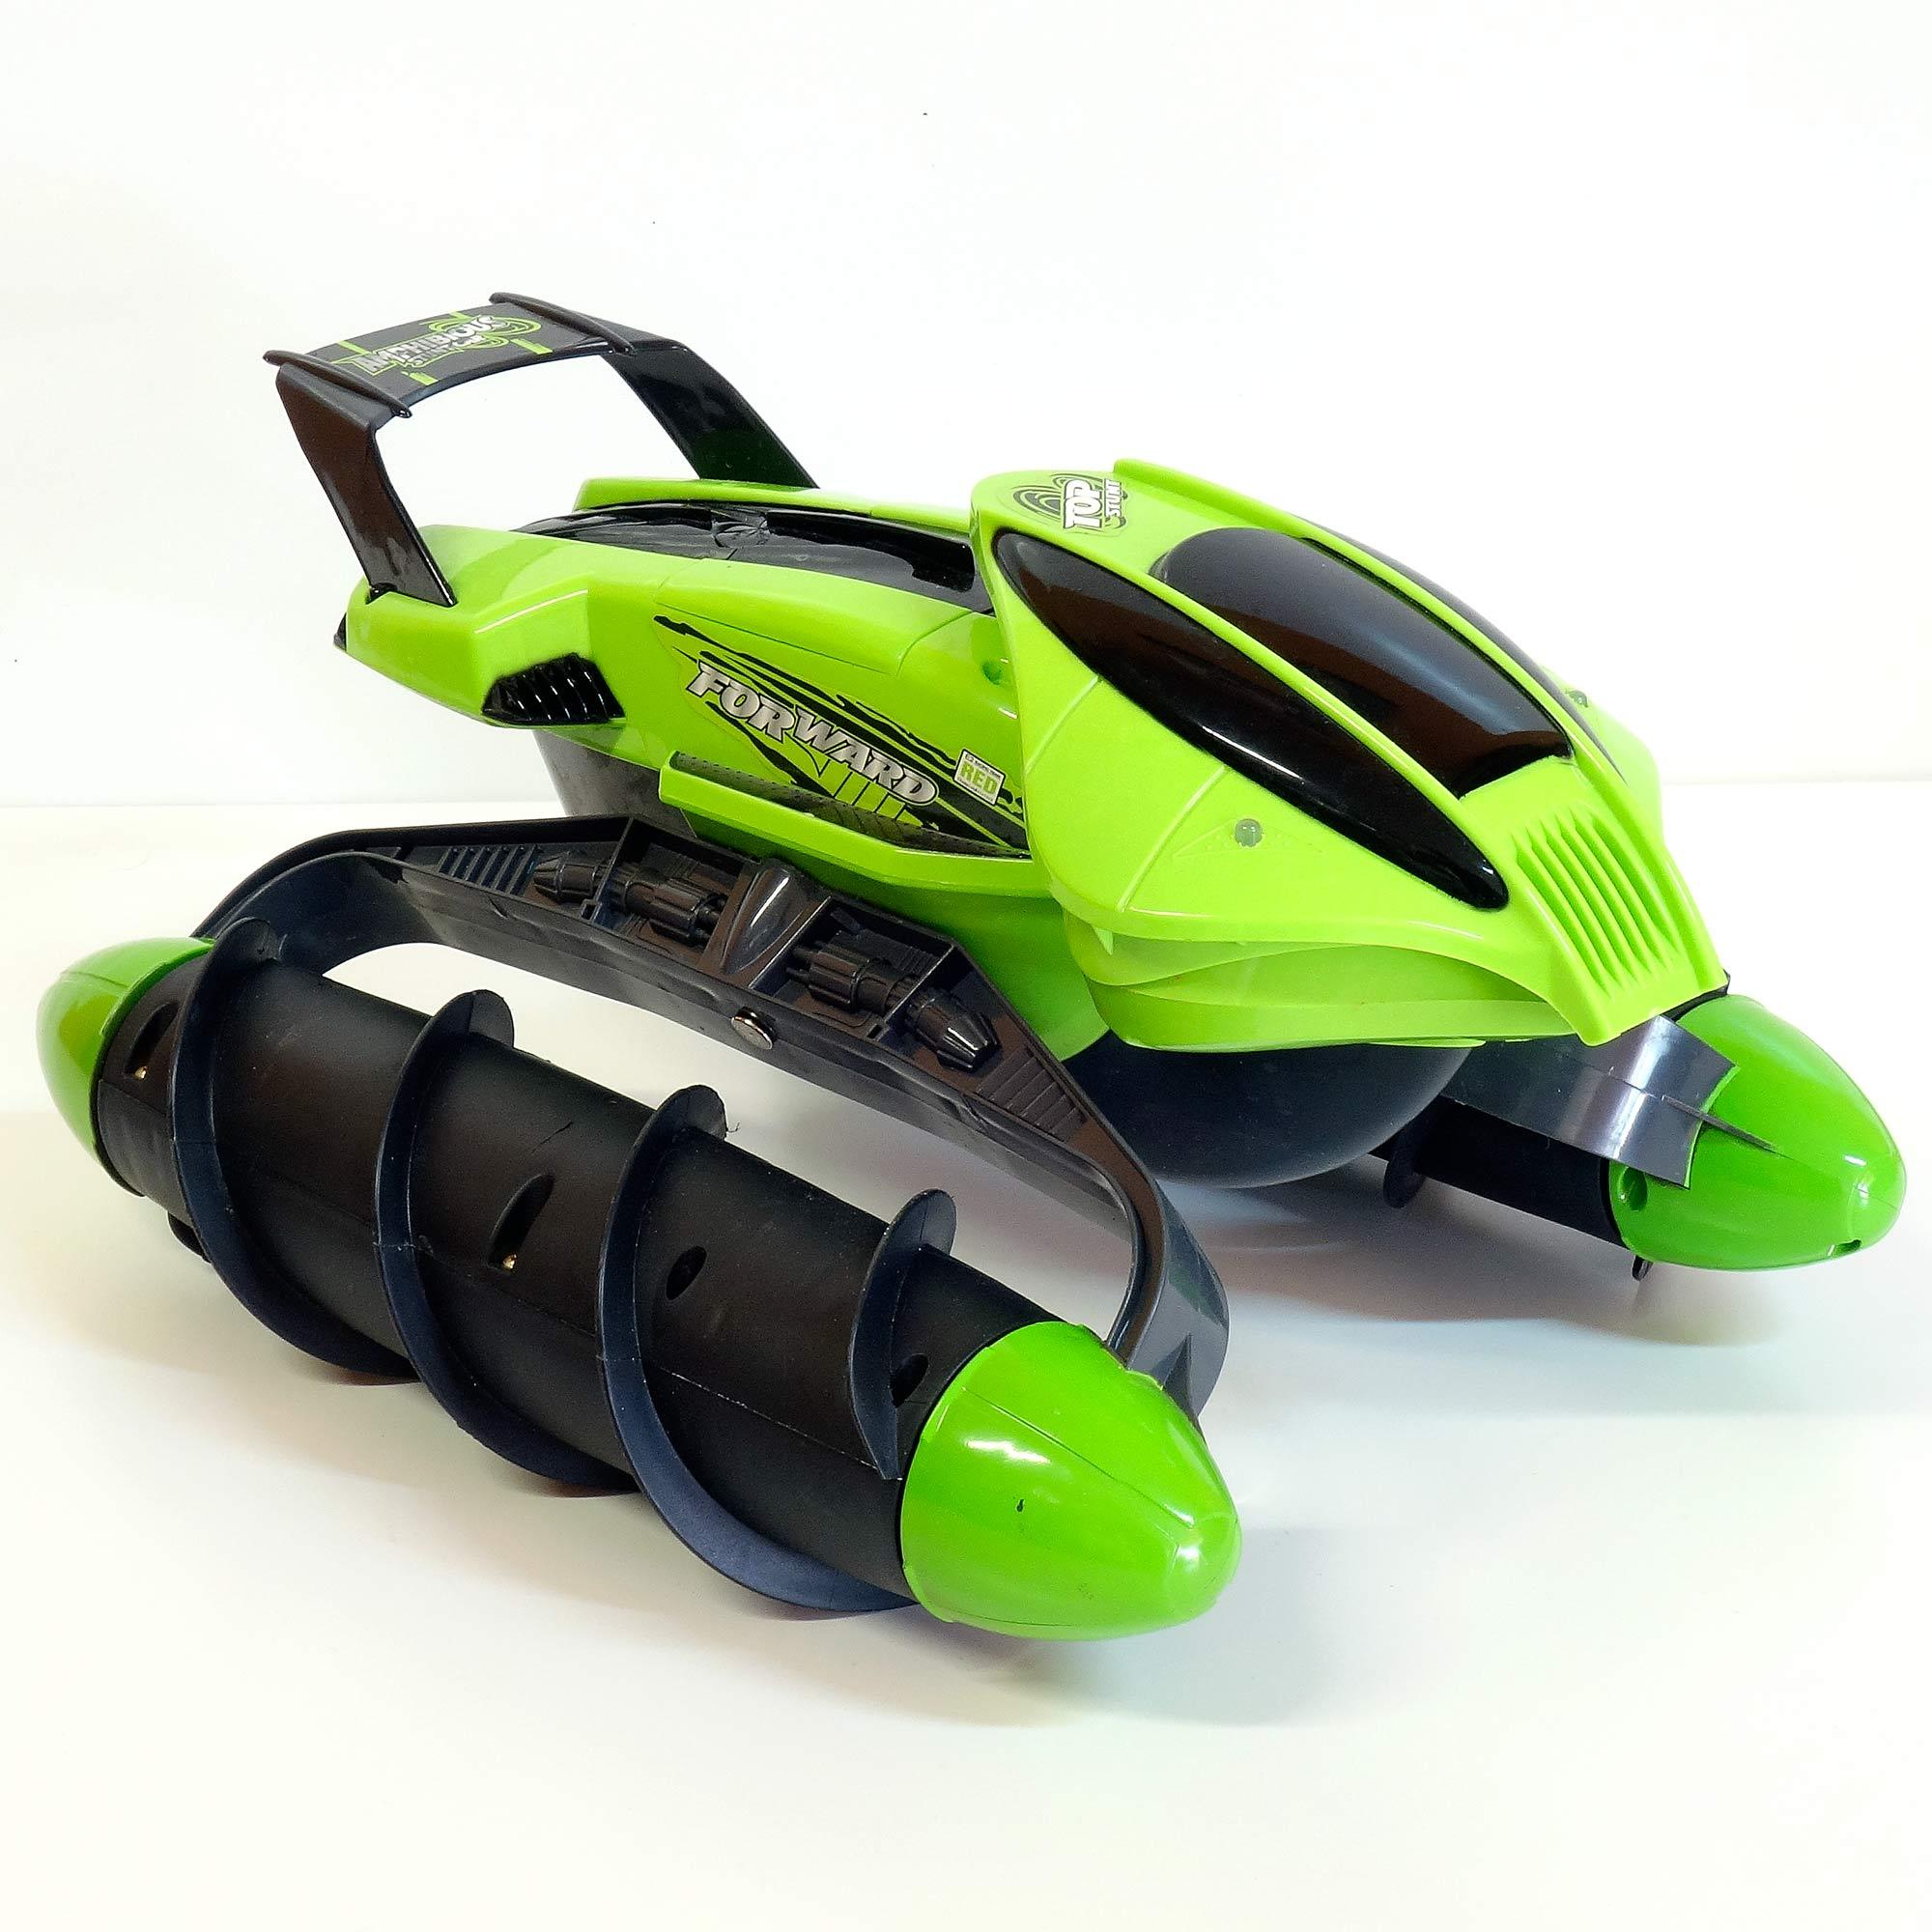 spielzeug ferngesteuertes rc auto gro es amphibienfahrzeug. Black Bedroom Furniture Sets. Home Design Ideas